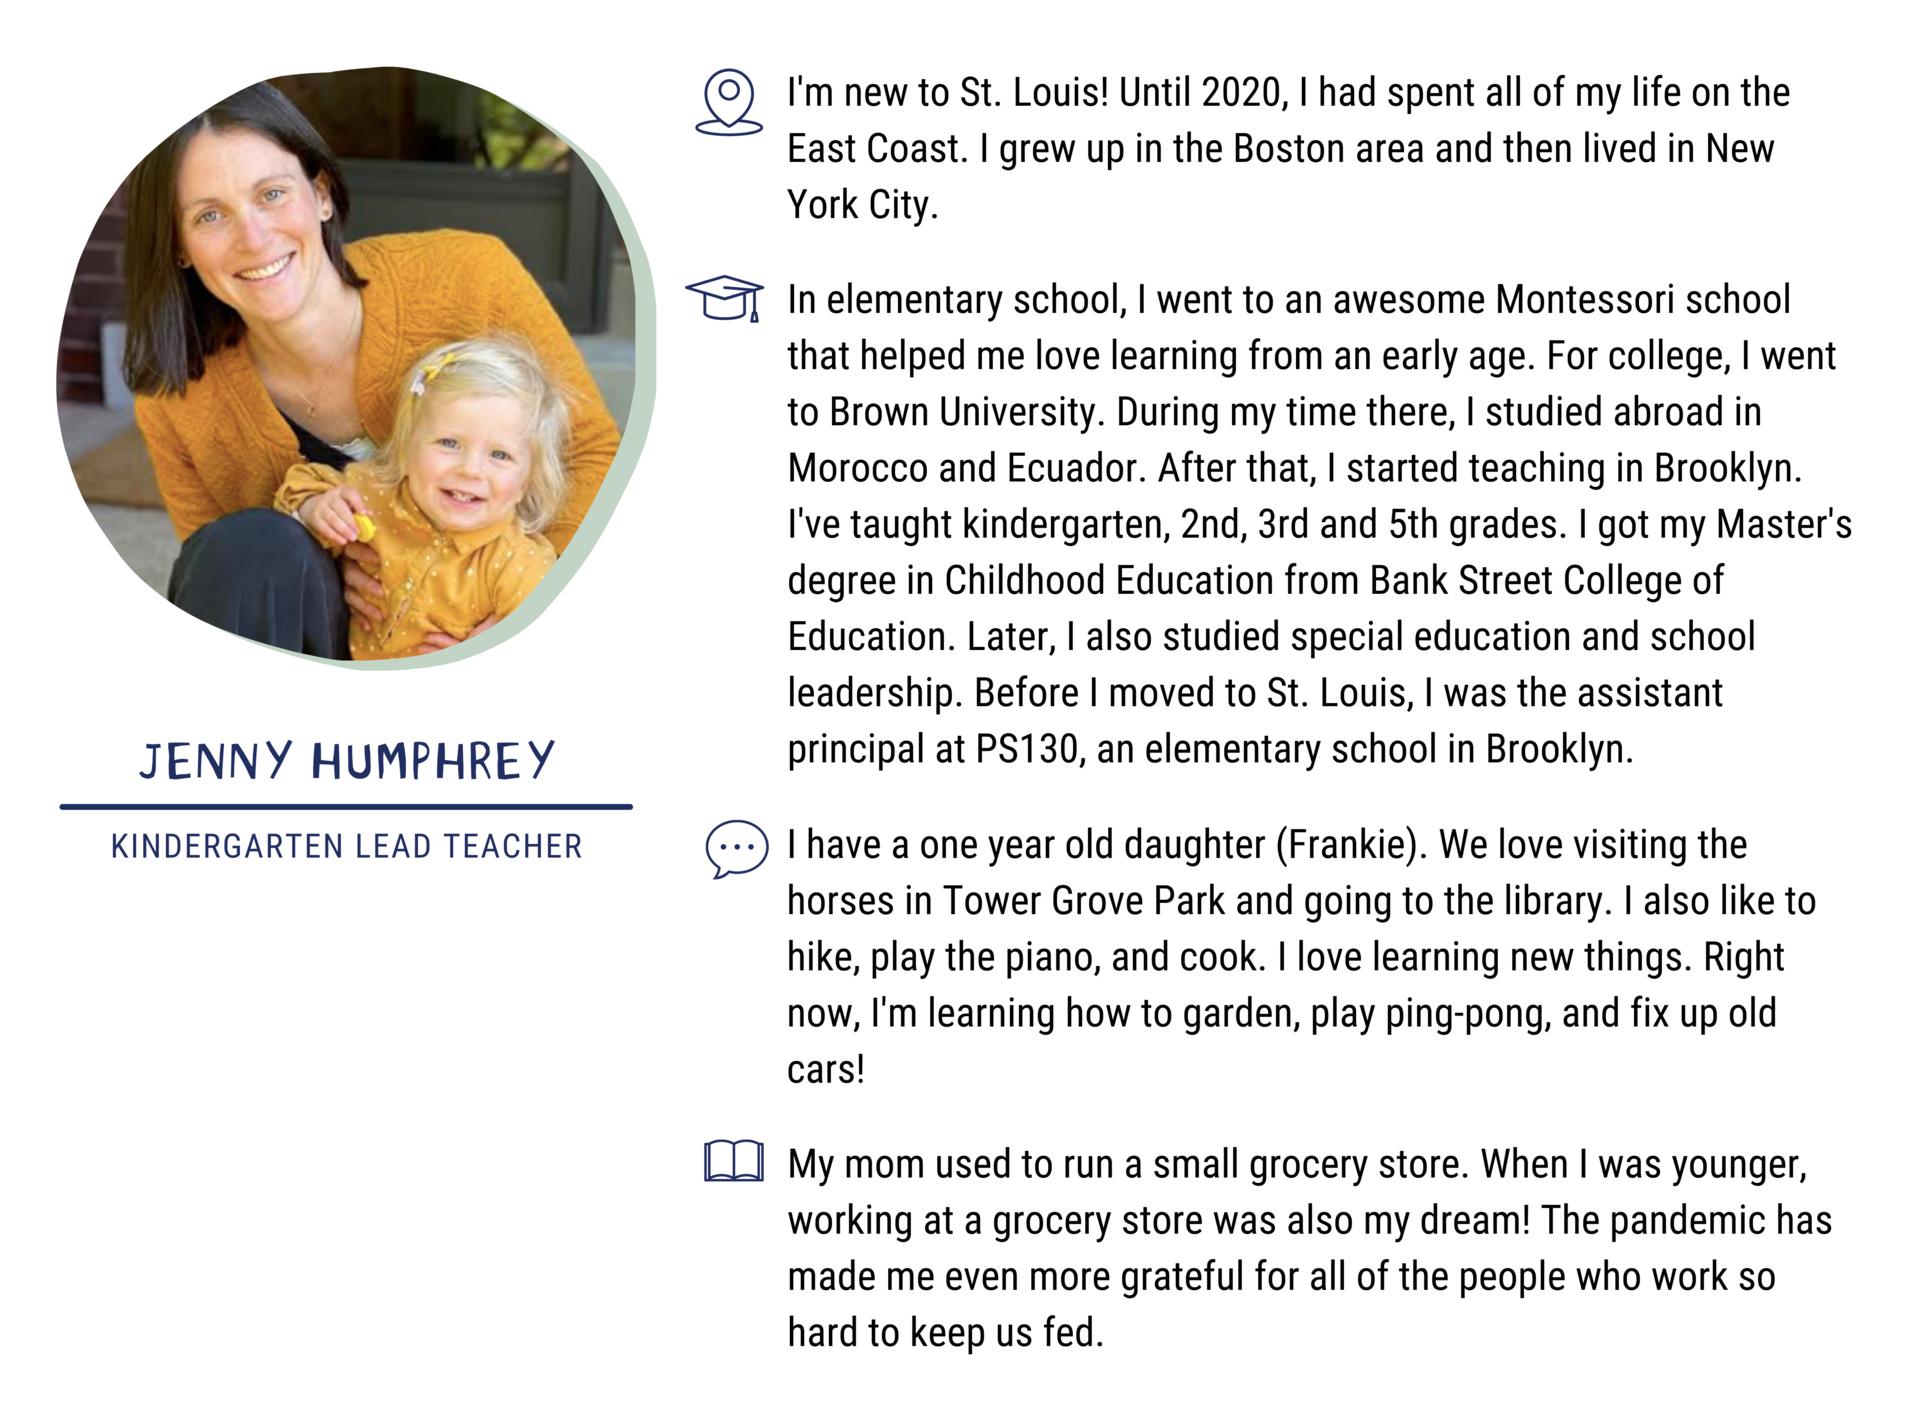 Jenny Humphrey, Kindergarten